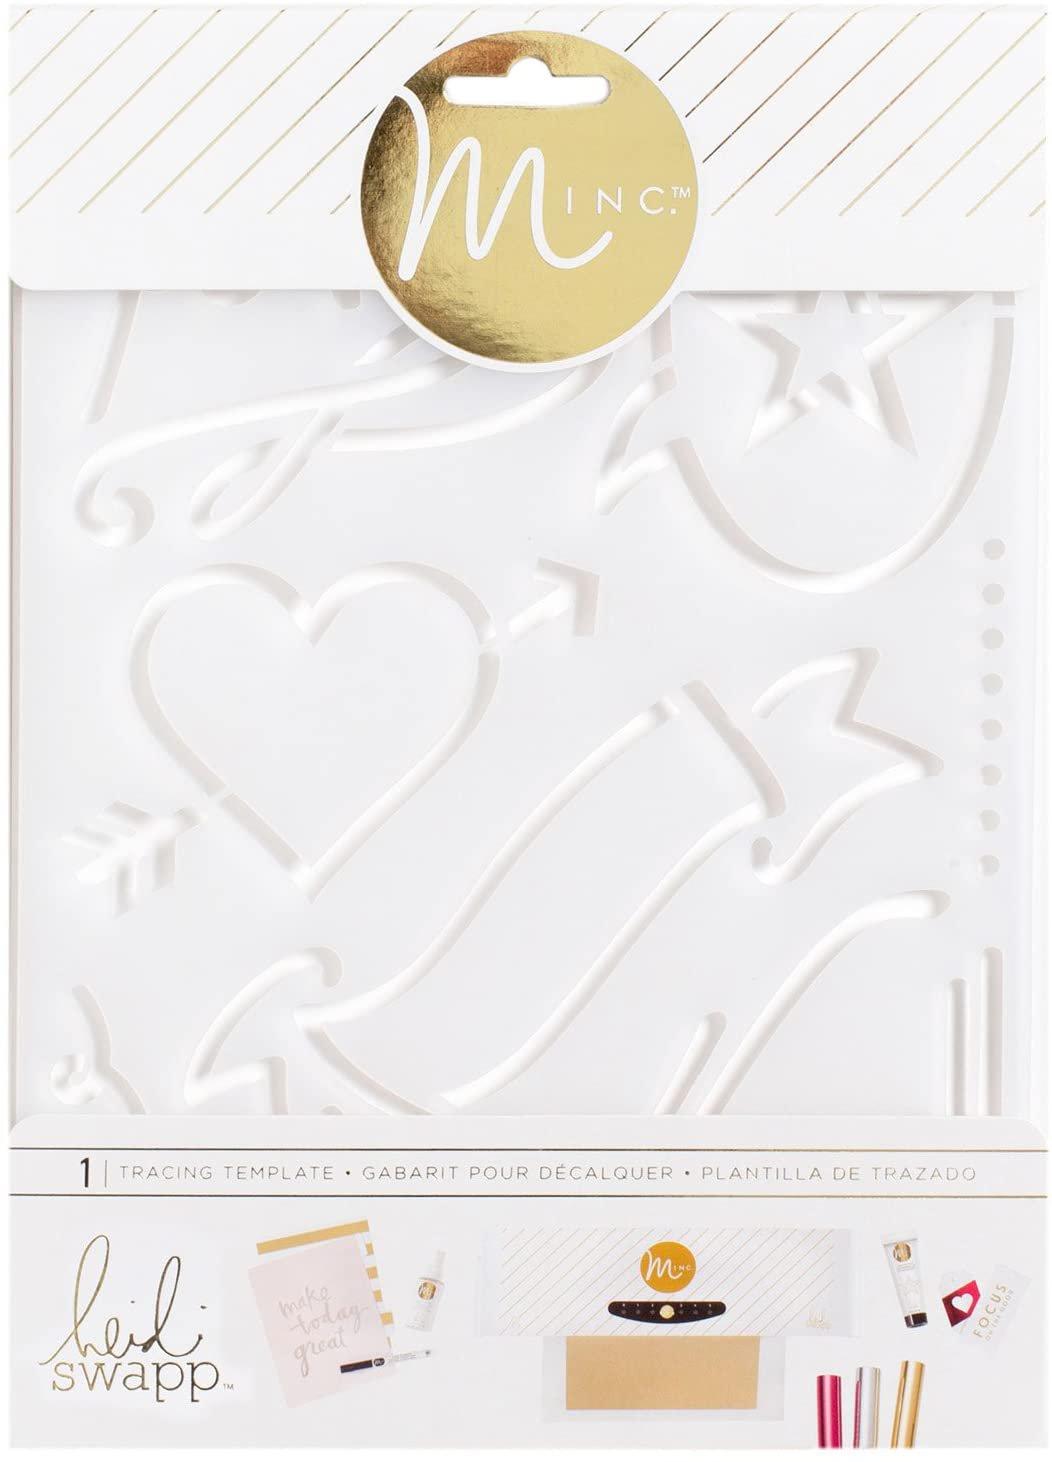 American Crafts Heidi Swapp Minc Tracing Template Love